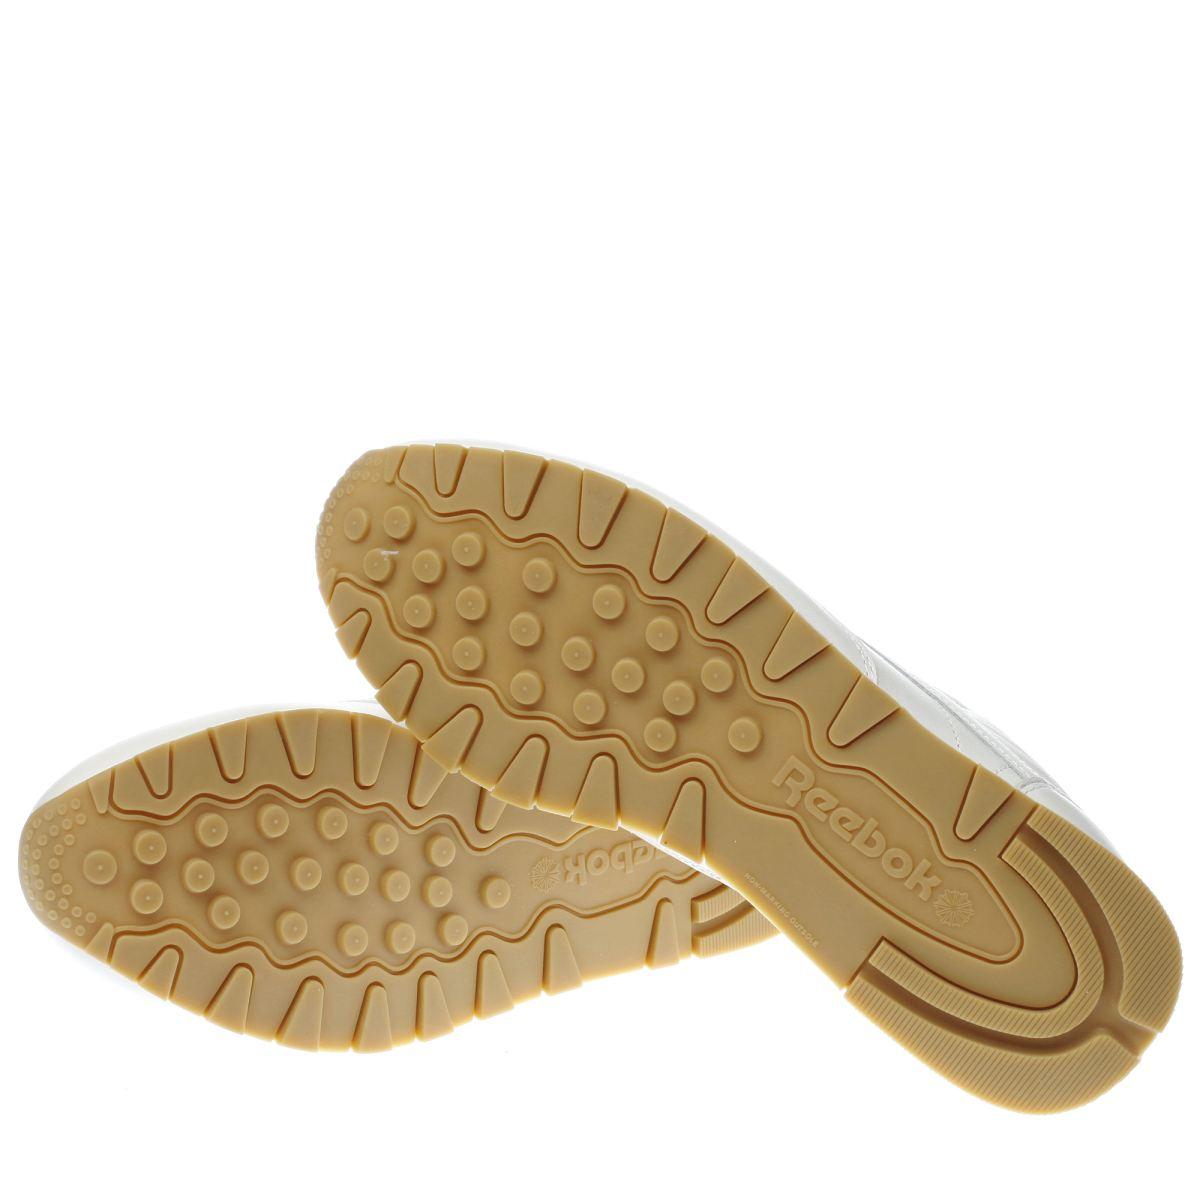 Damen Elfenbein reebok Classic Leather Zip Qualität Sneaker | schuh Gute Qualität Zip beliebte Schuhe a2632d